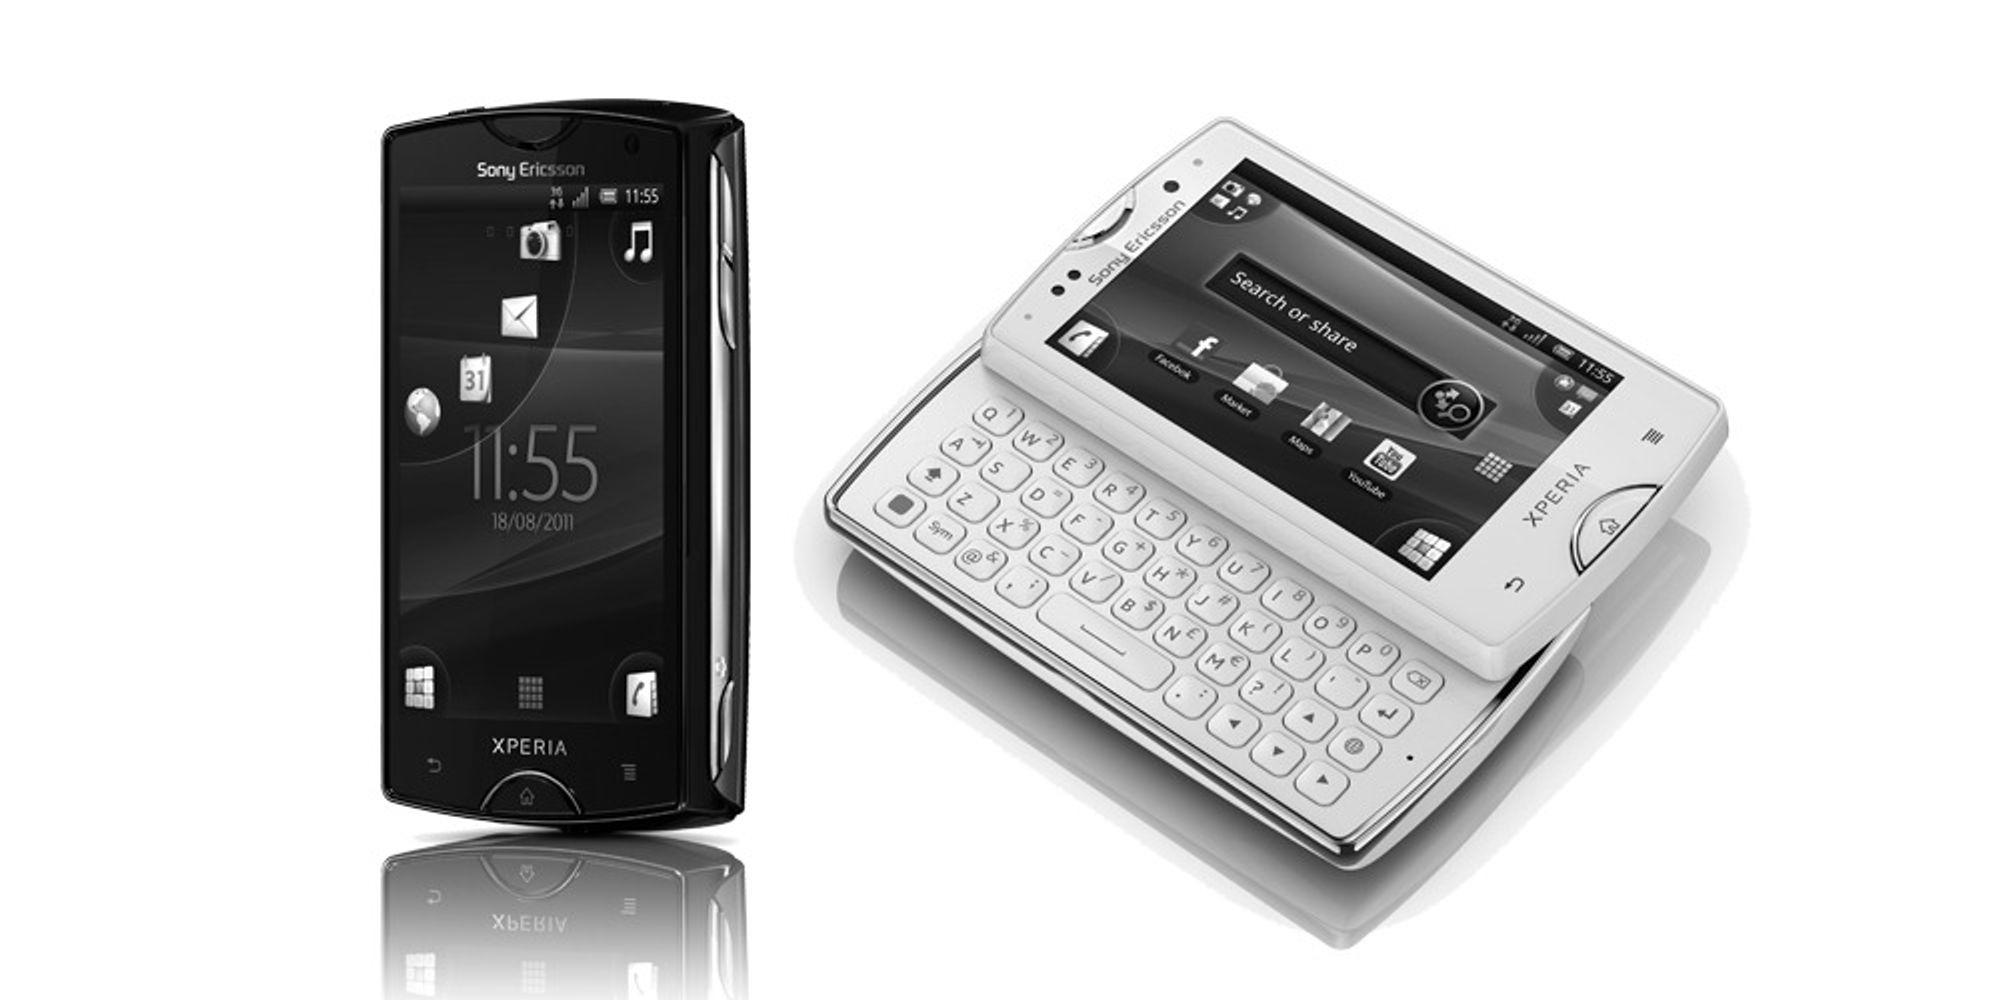 Her er Xperia Mini og Xperia Mini Pro